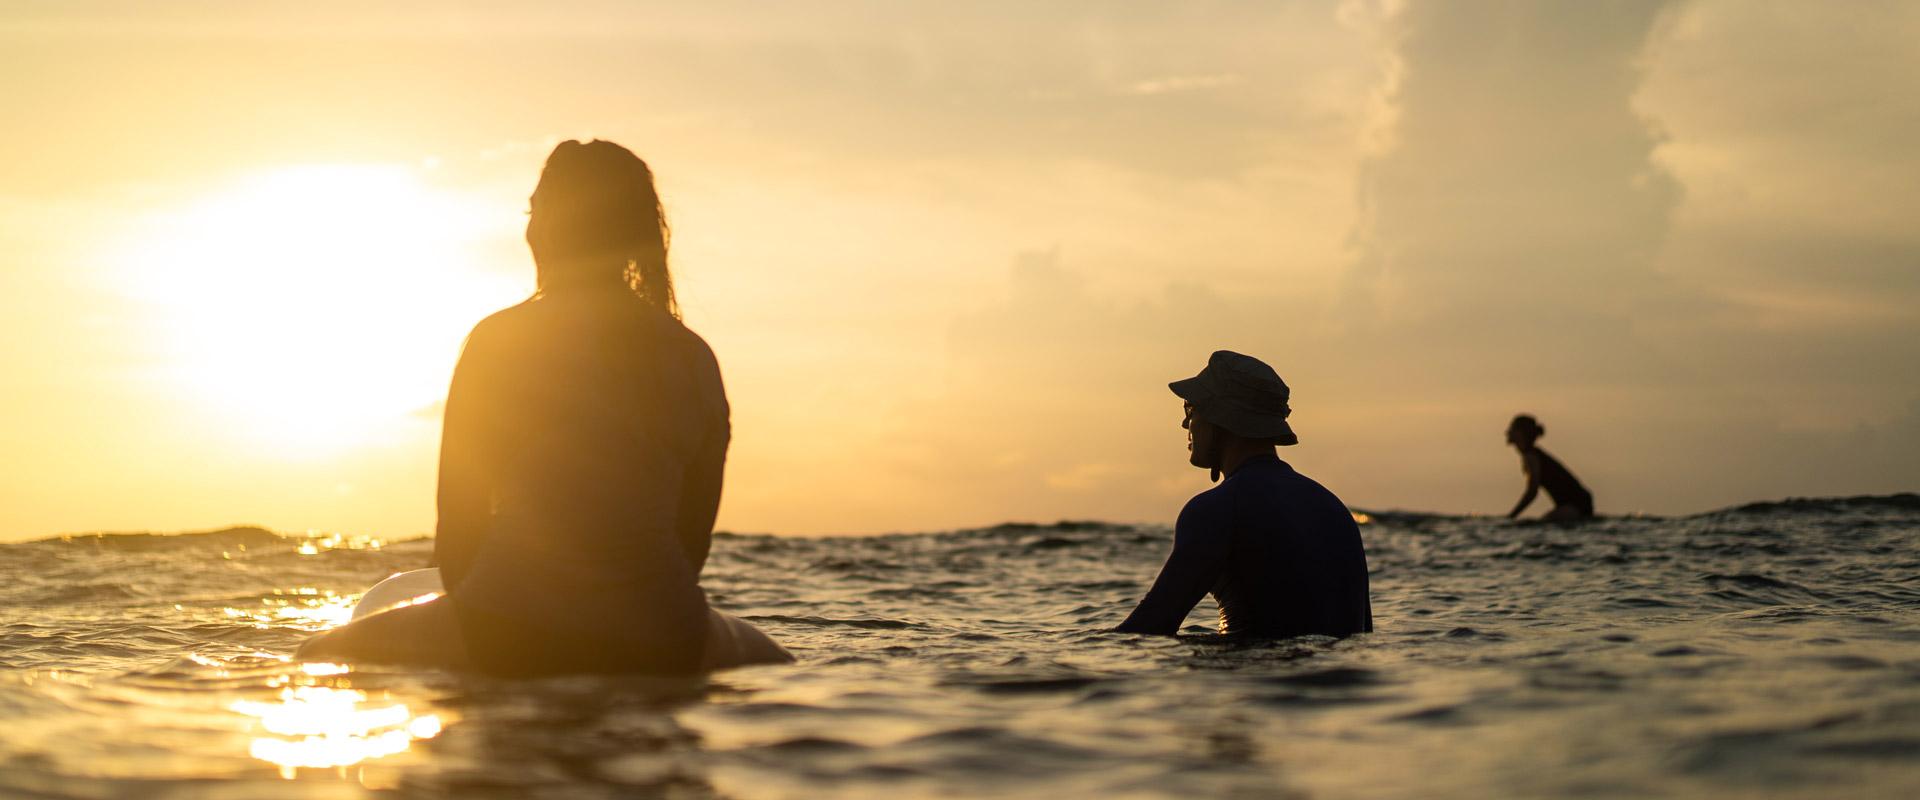 surf-camp-nicaragua